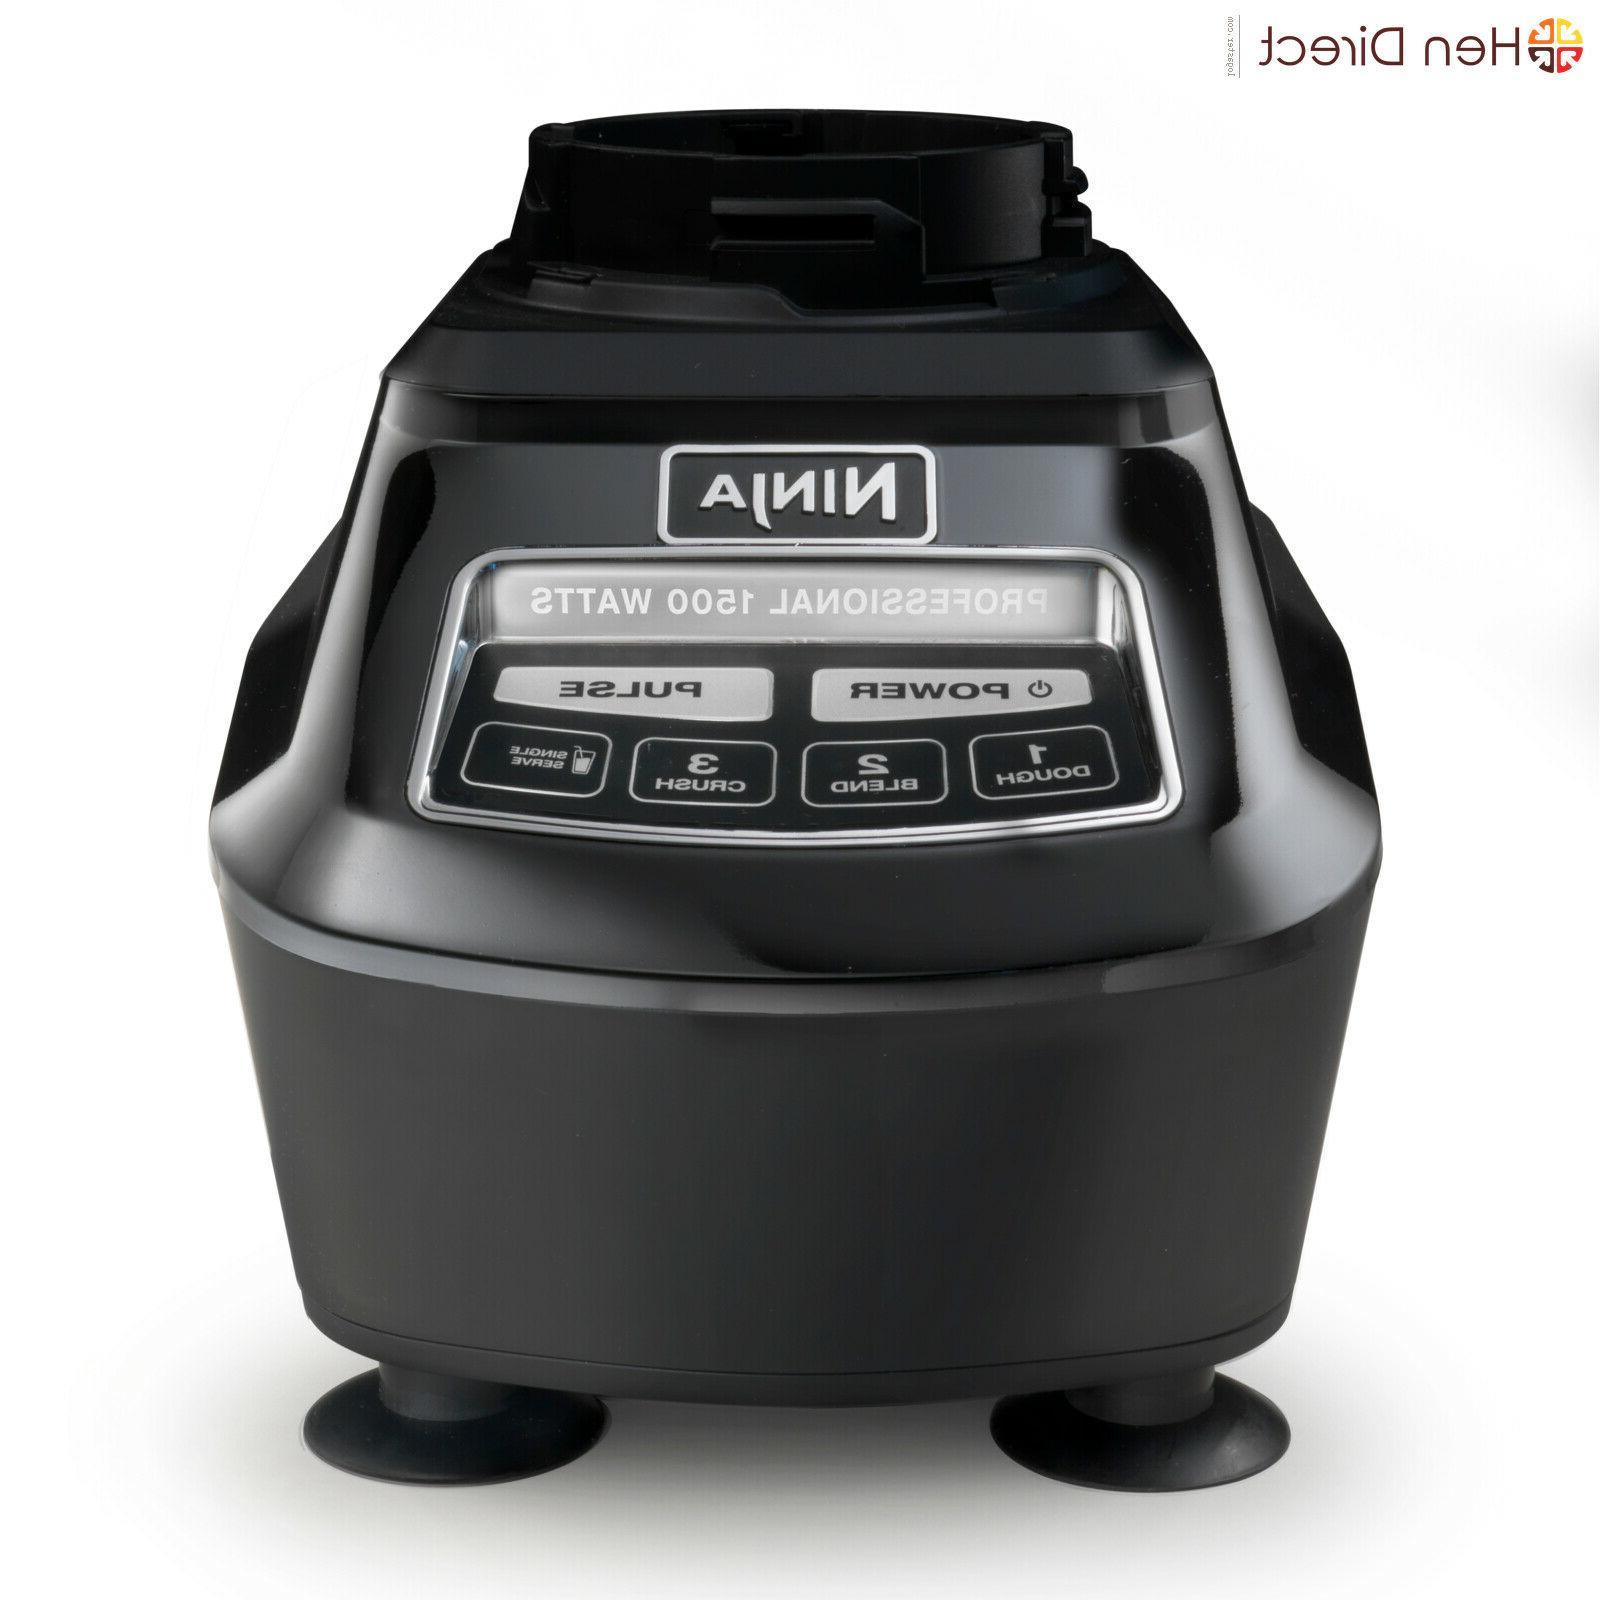 Smoothie Blender Mega Kitchen System Crush with Ease